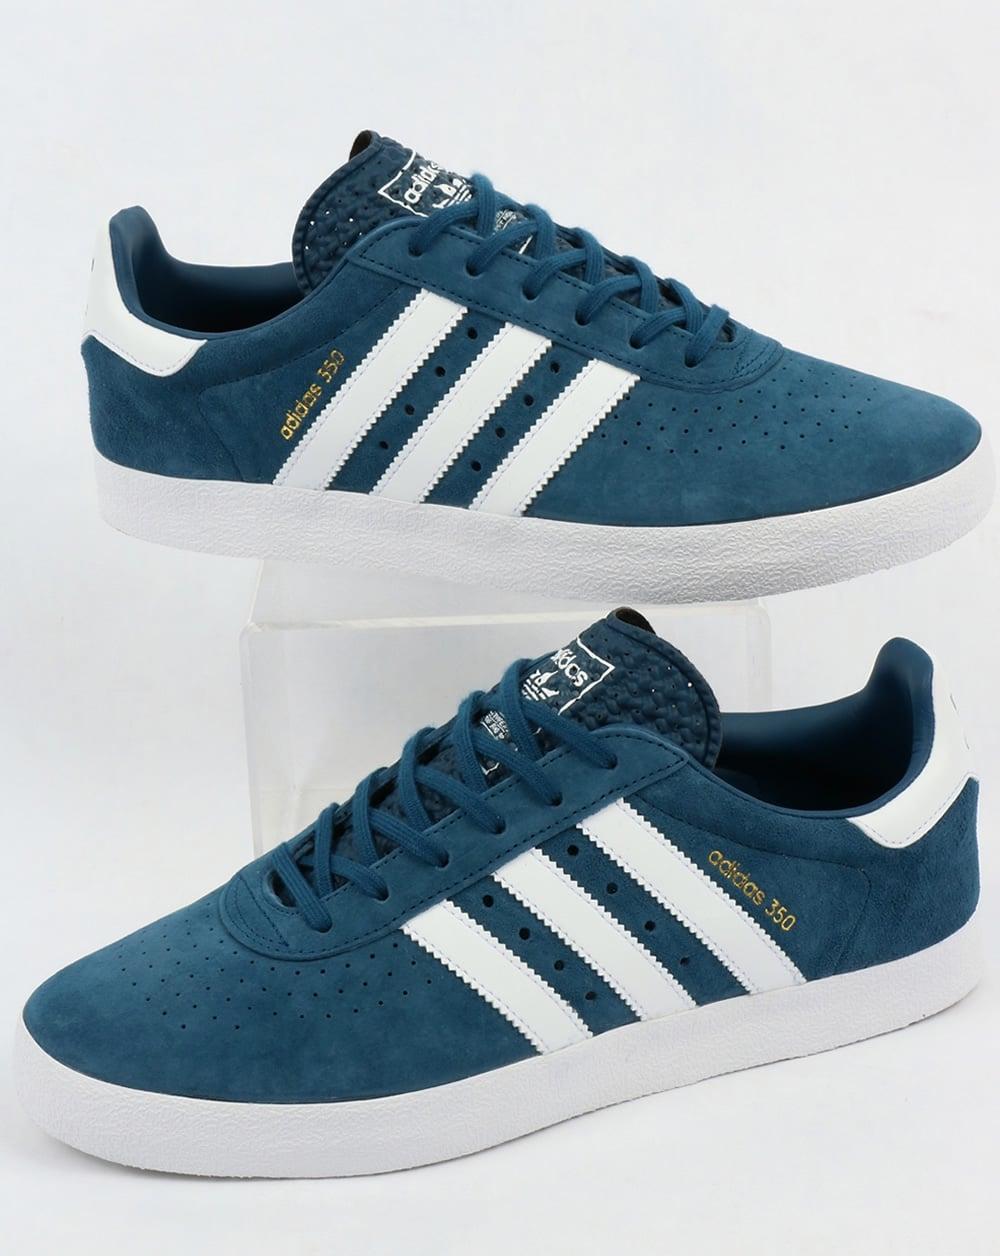 dec6b160e96 adidas Trainers Adidas 350 Trainers Blue Night White